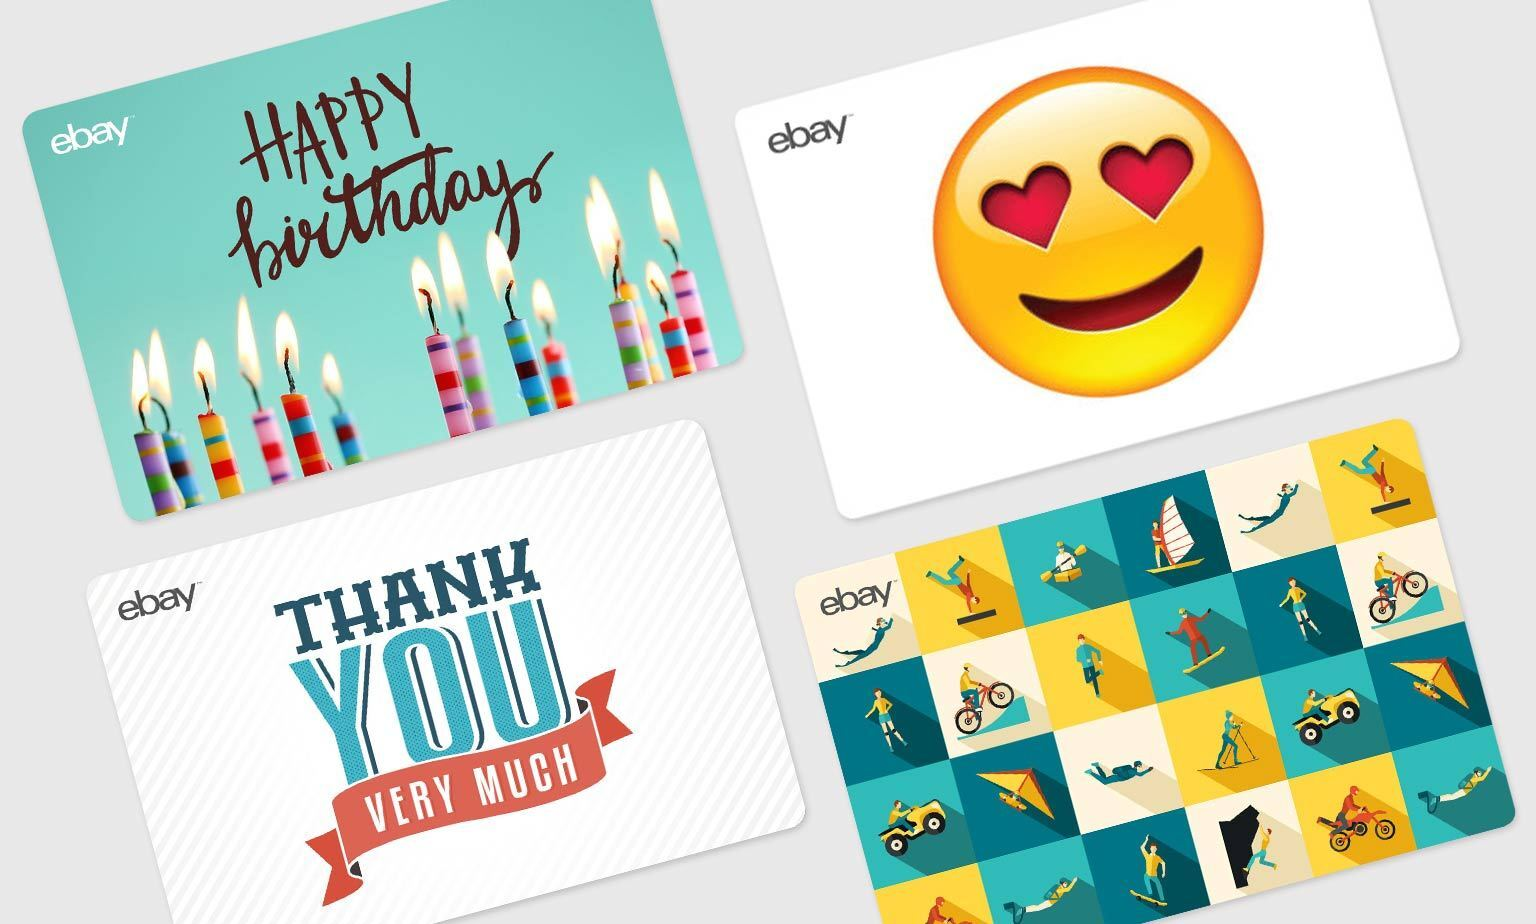 Restaurant dining gift cards ebay digital ebay gift cards xflitez Images